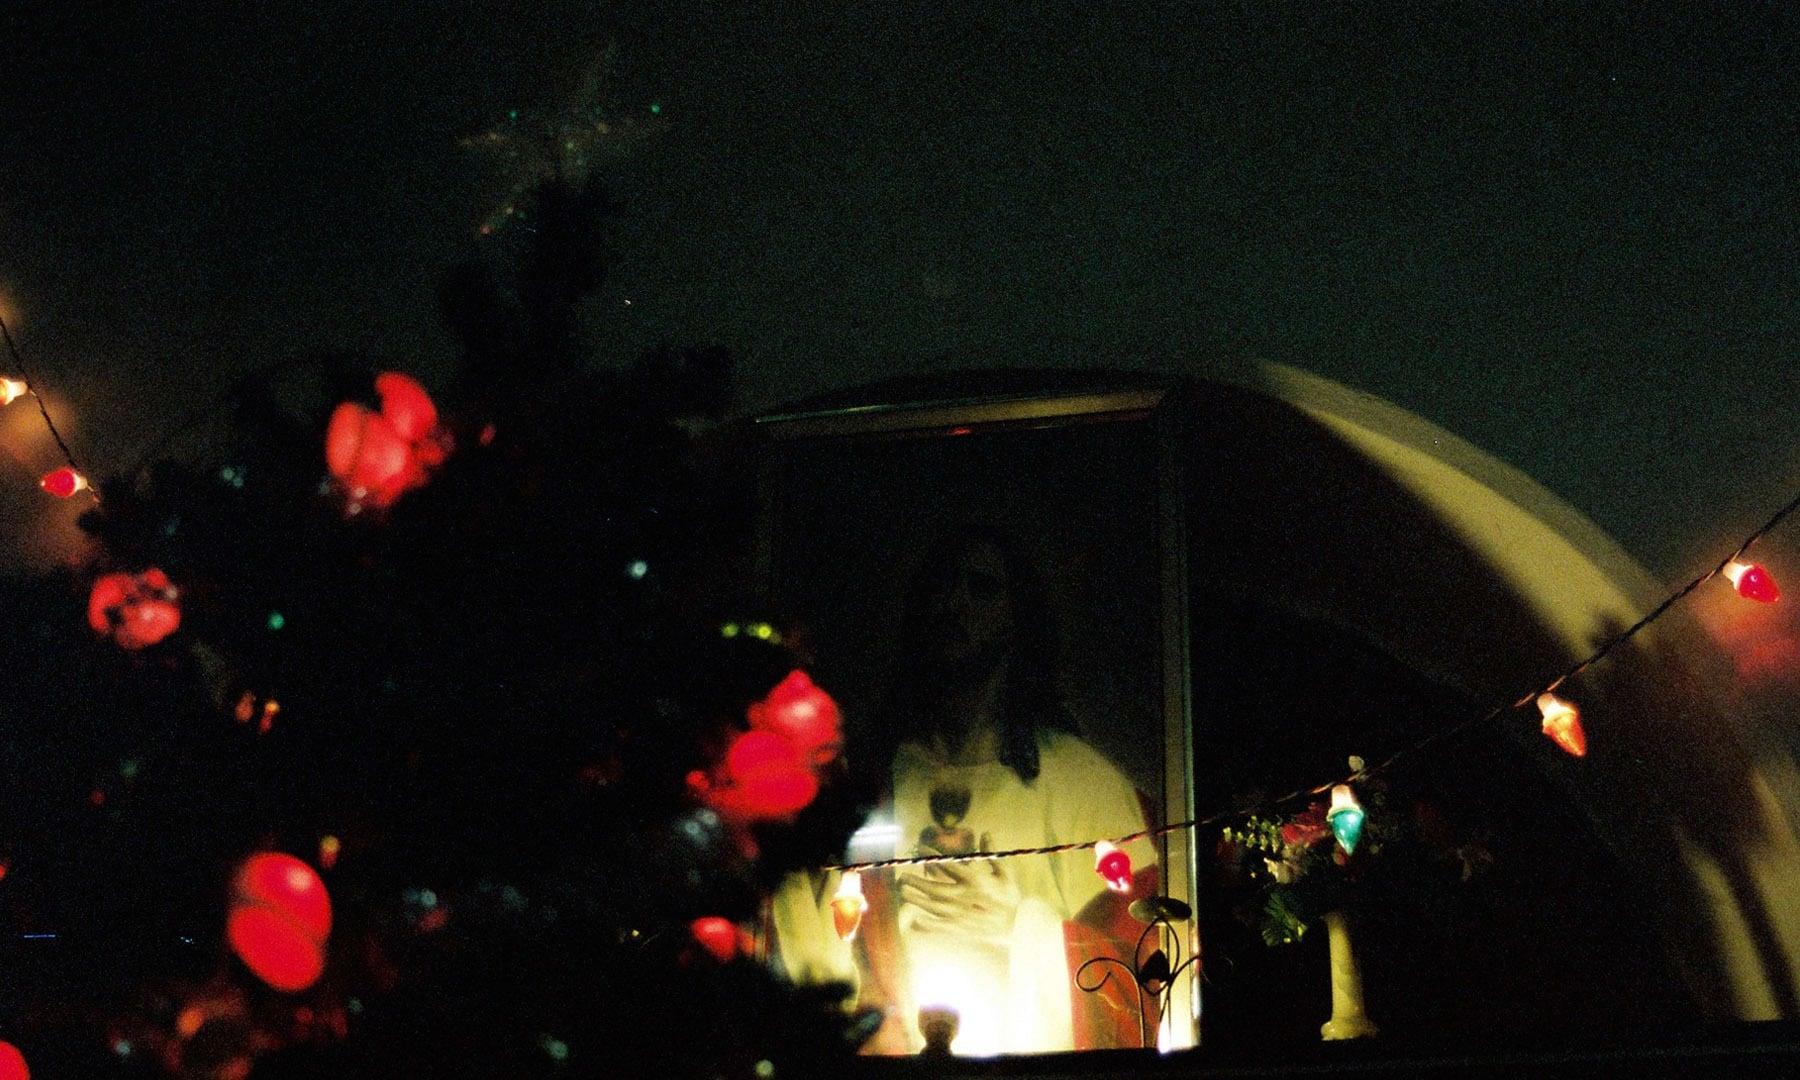 Christmas preparations at Karachi's Bohri bazaar | Stephan Andrew, White Star